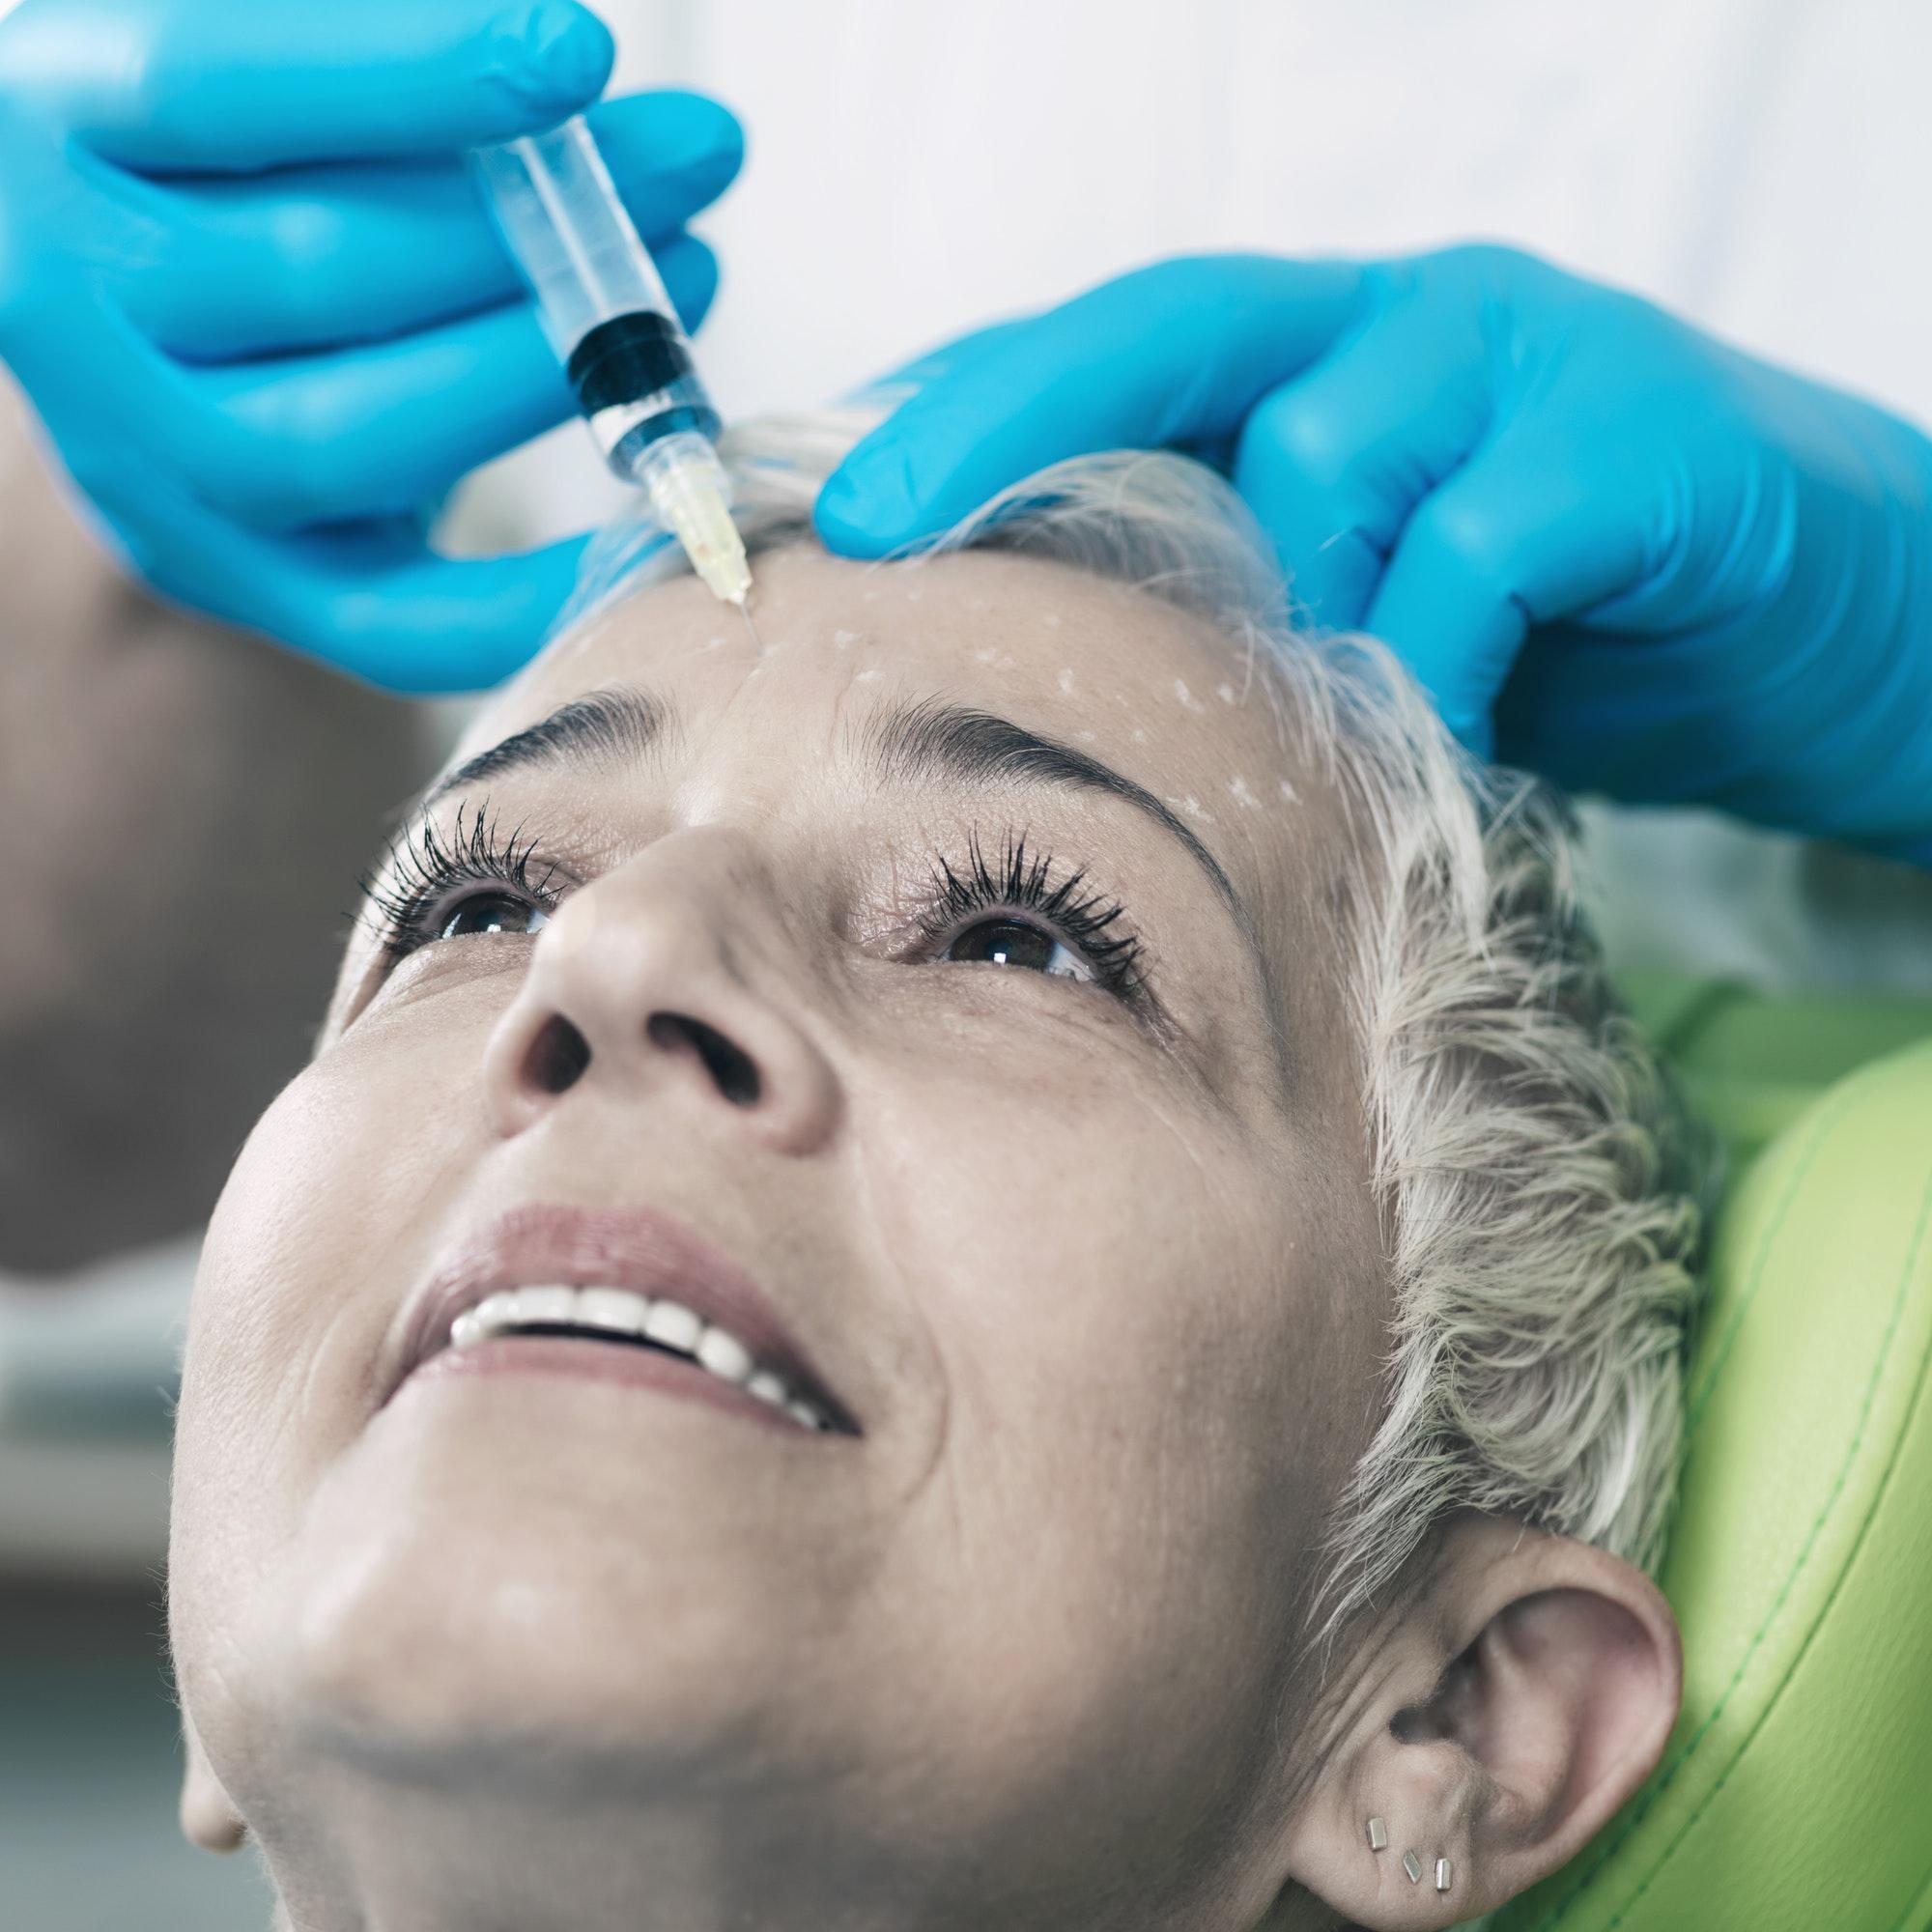 Anti-Aging Injections. Senior Woman Receiving Botulinum Toxin In